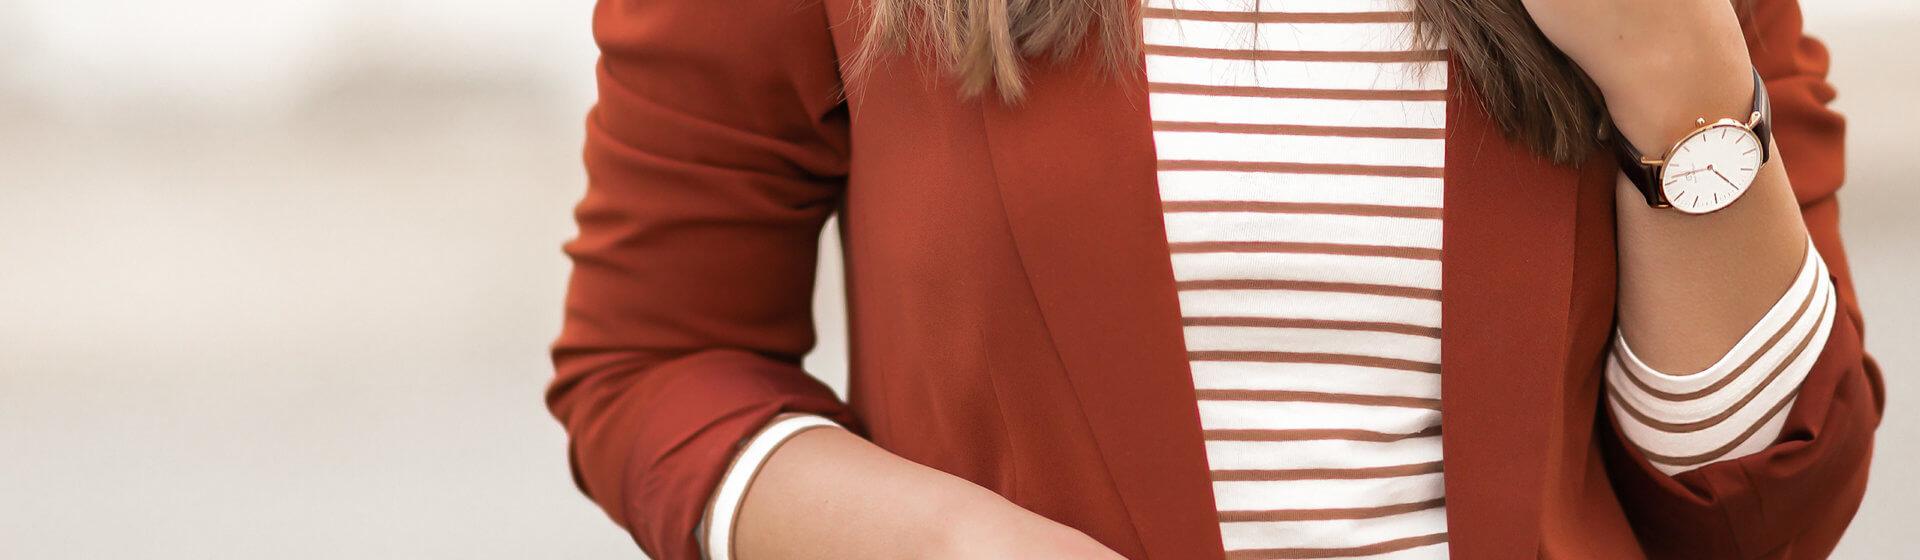 Trendfarbe Rostrot stylen, Herbstoutfit, Herbsttrends, Shoelove by Deichmann